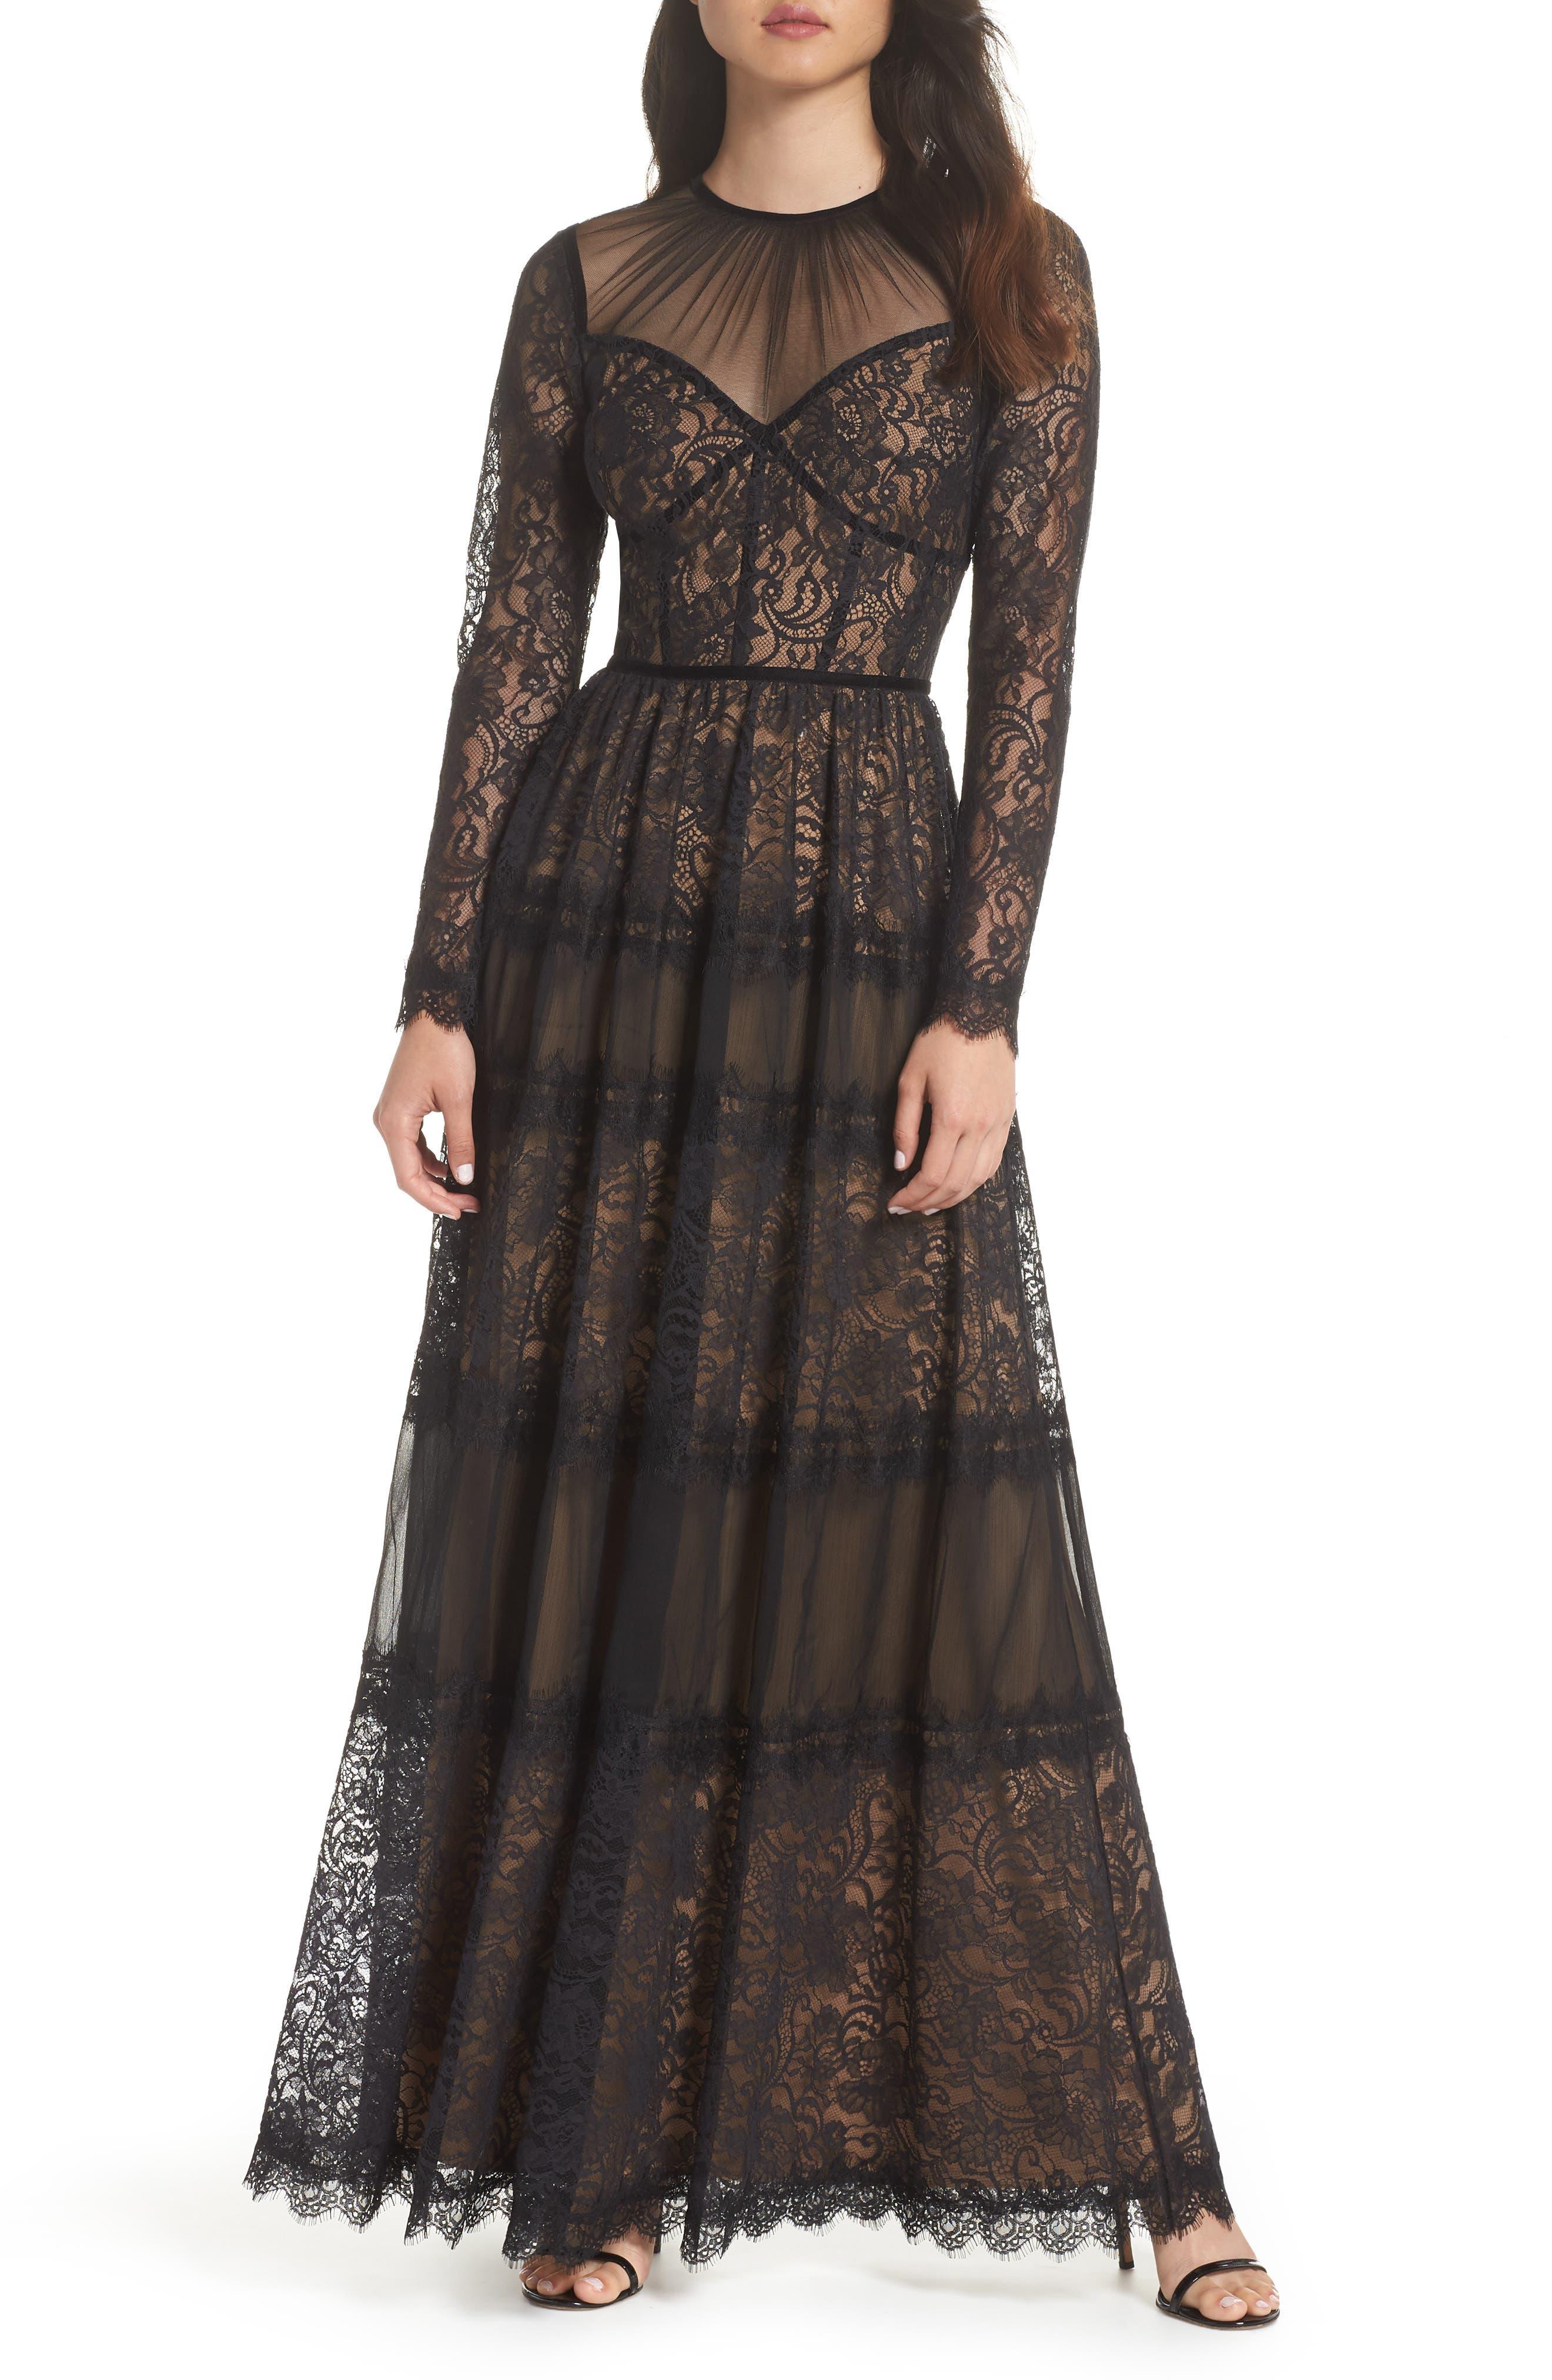 0a99fcf8cd6b7 Edwardian Evening Gowns | Victorian Evening Dresses Womens Tadashi Shoji  Lace Gown $688.00 AT vintagedancer.